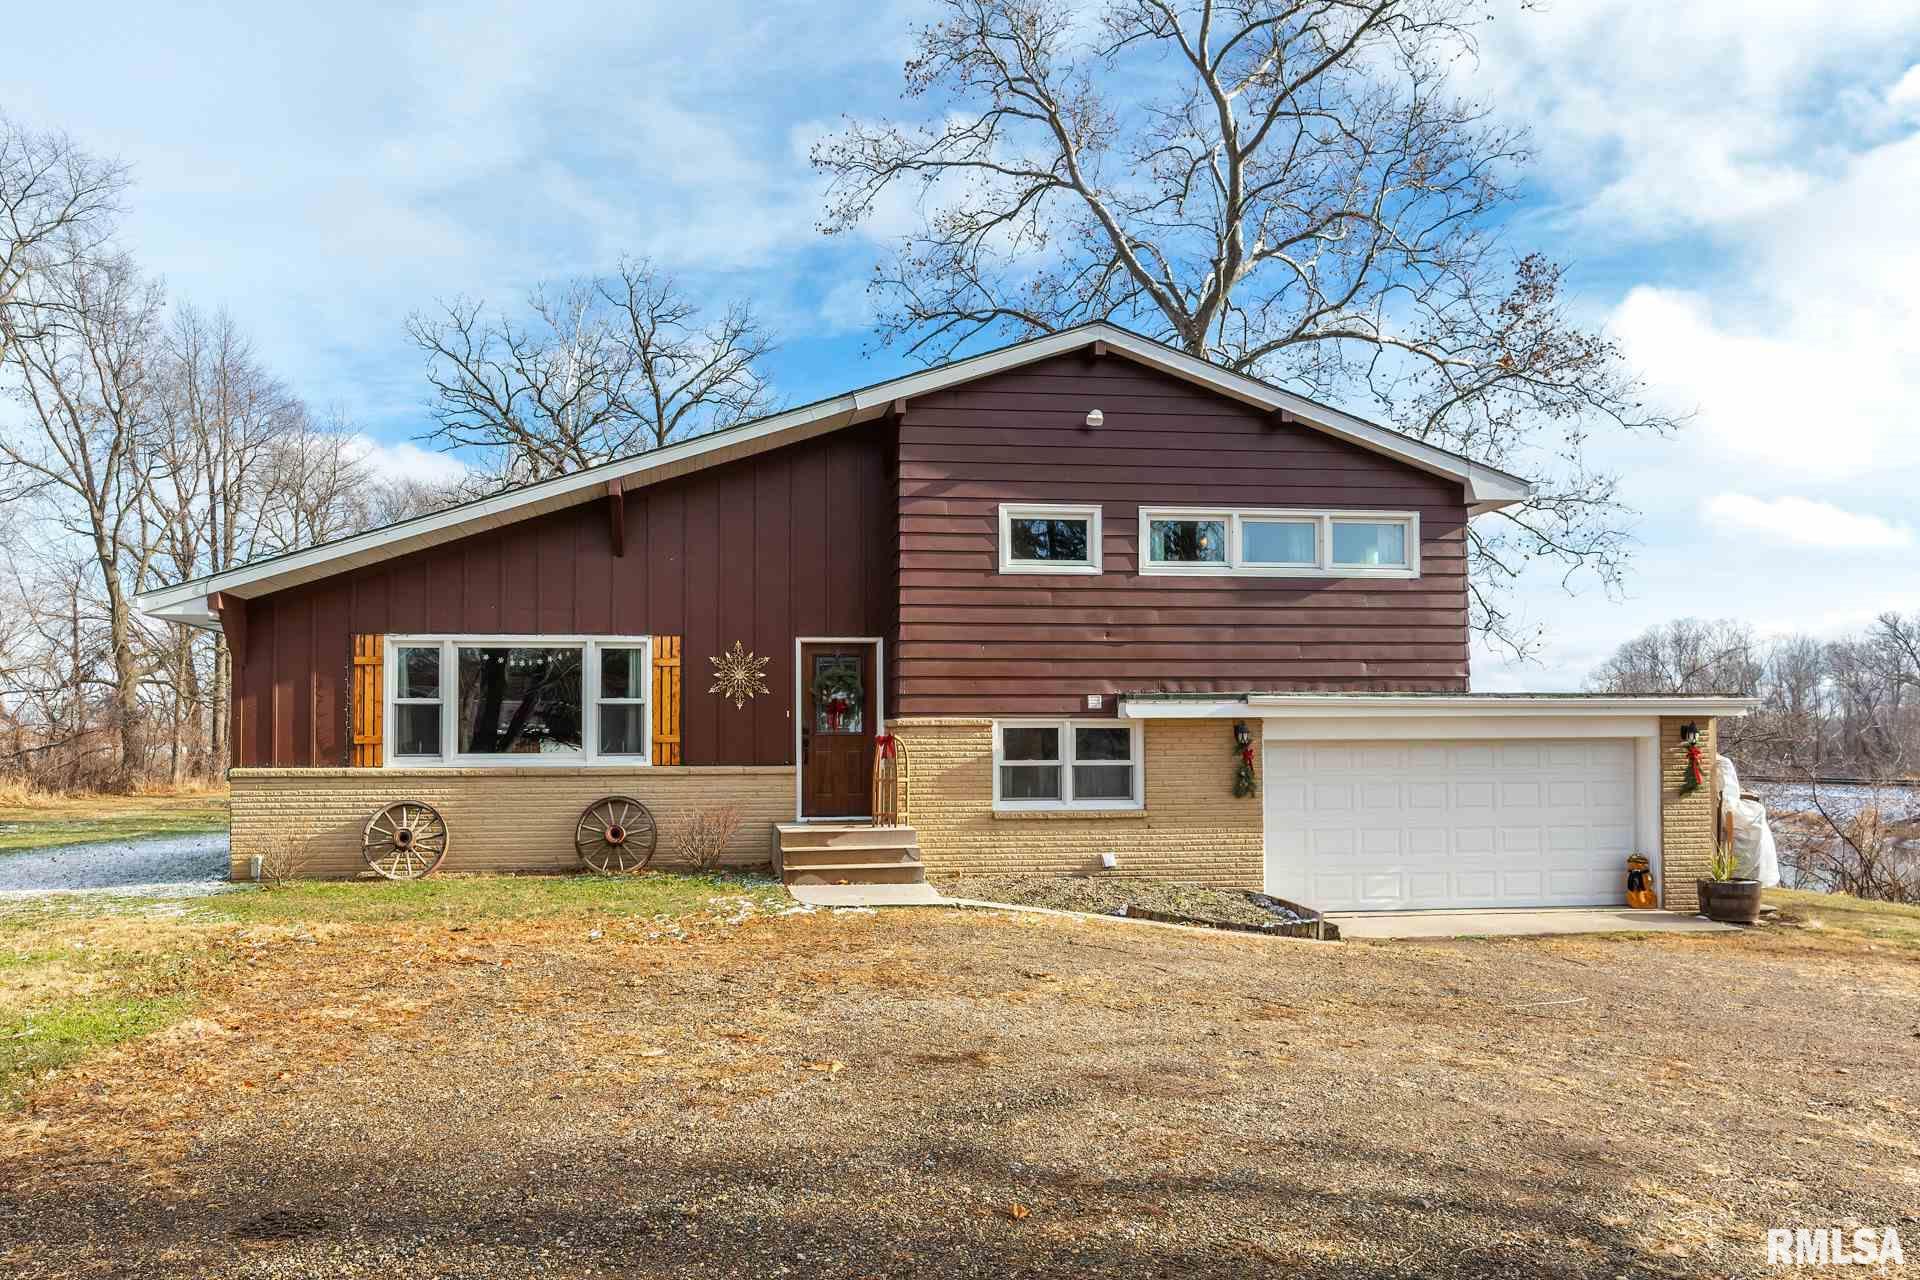 2465 260TH Property Photo - De Witt, IA real estate listing